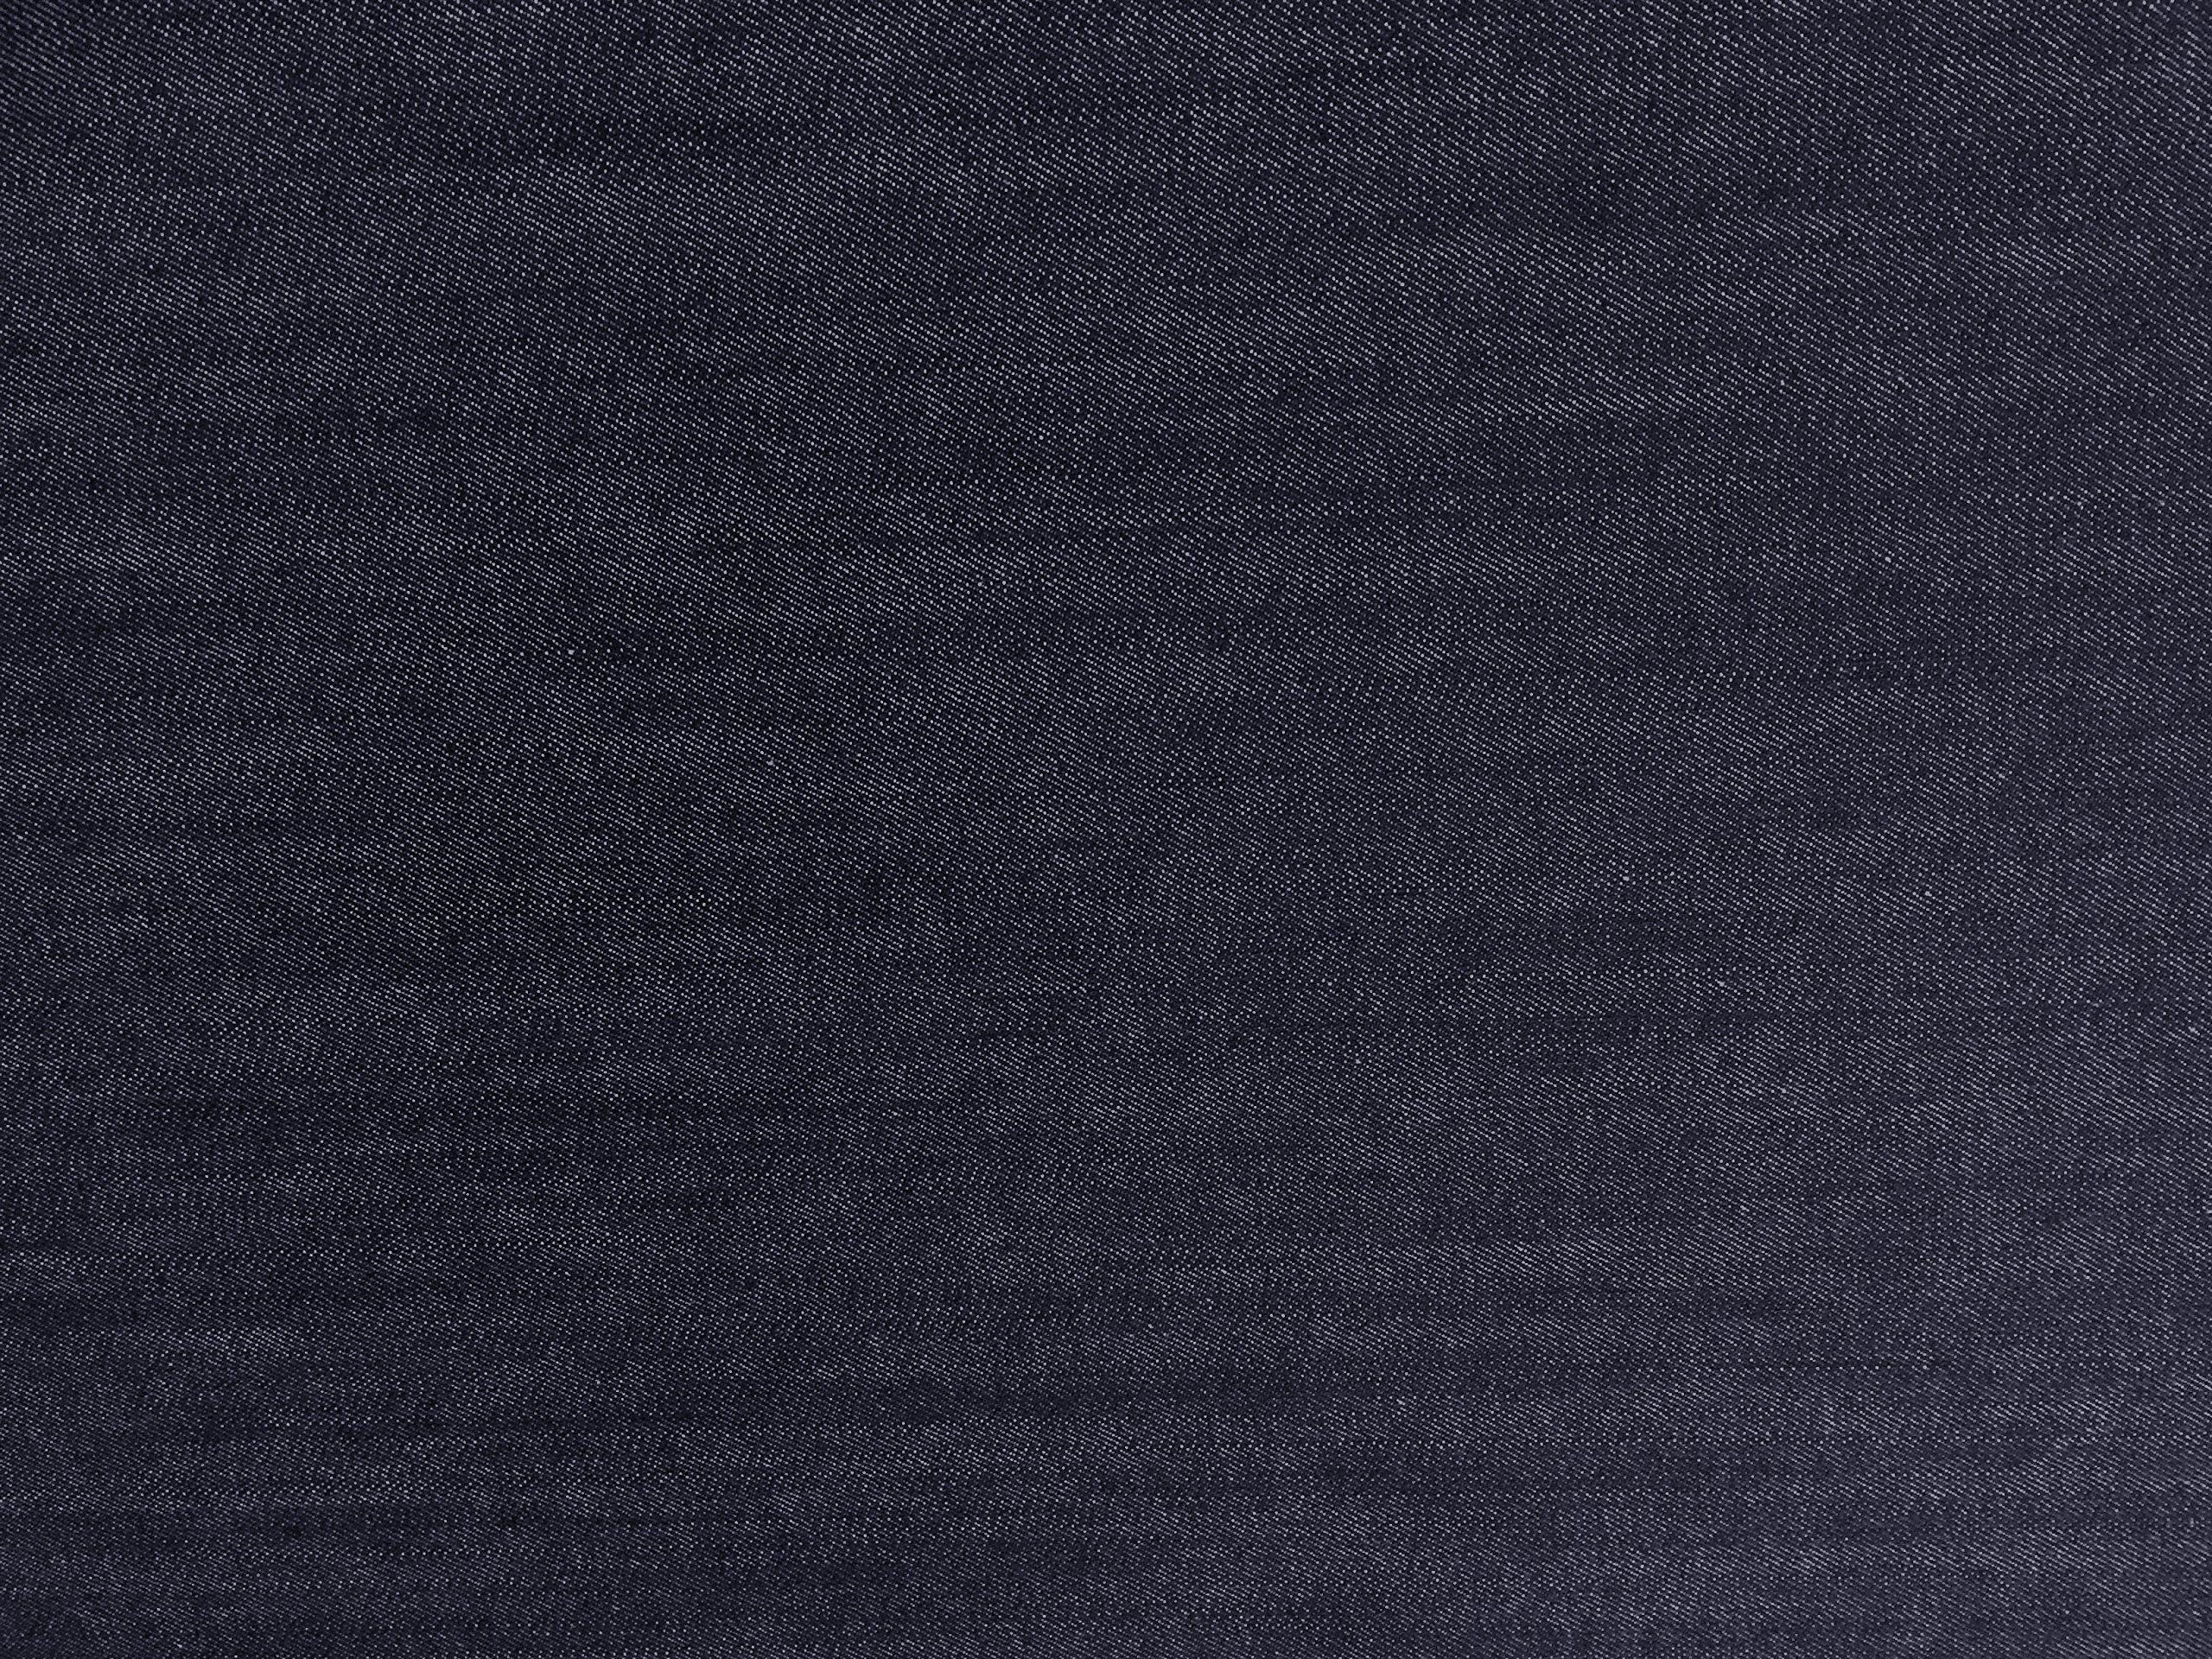 Real Jean Denim Futon Mattress Covers - Mattress Protector Slipcovers. (Twin Size, Dark Blue Denim)